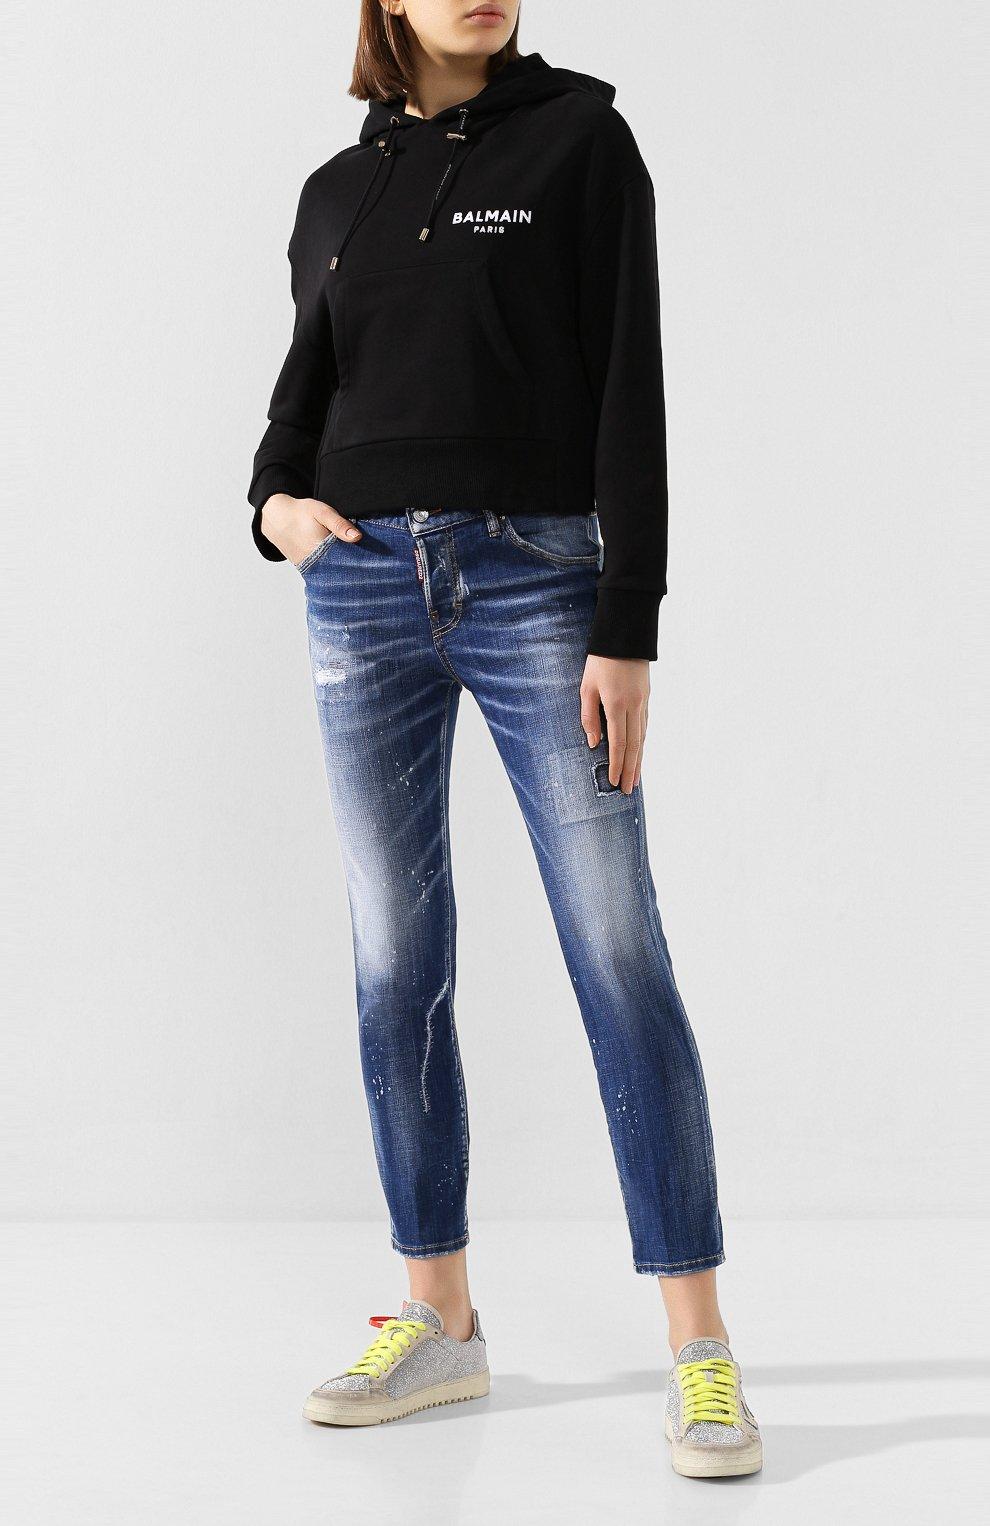 Женские джинсы DSQUARED2 синего цвета, арт. S75LB0281/S30342 | Фото 2